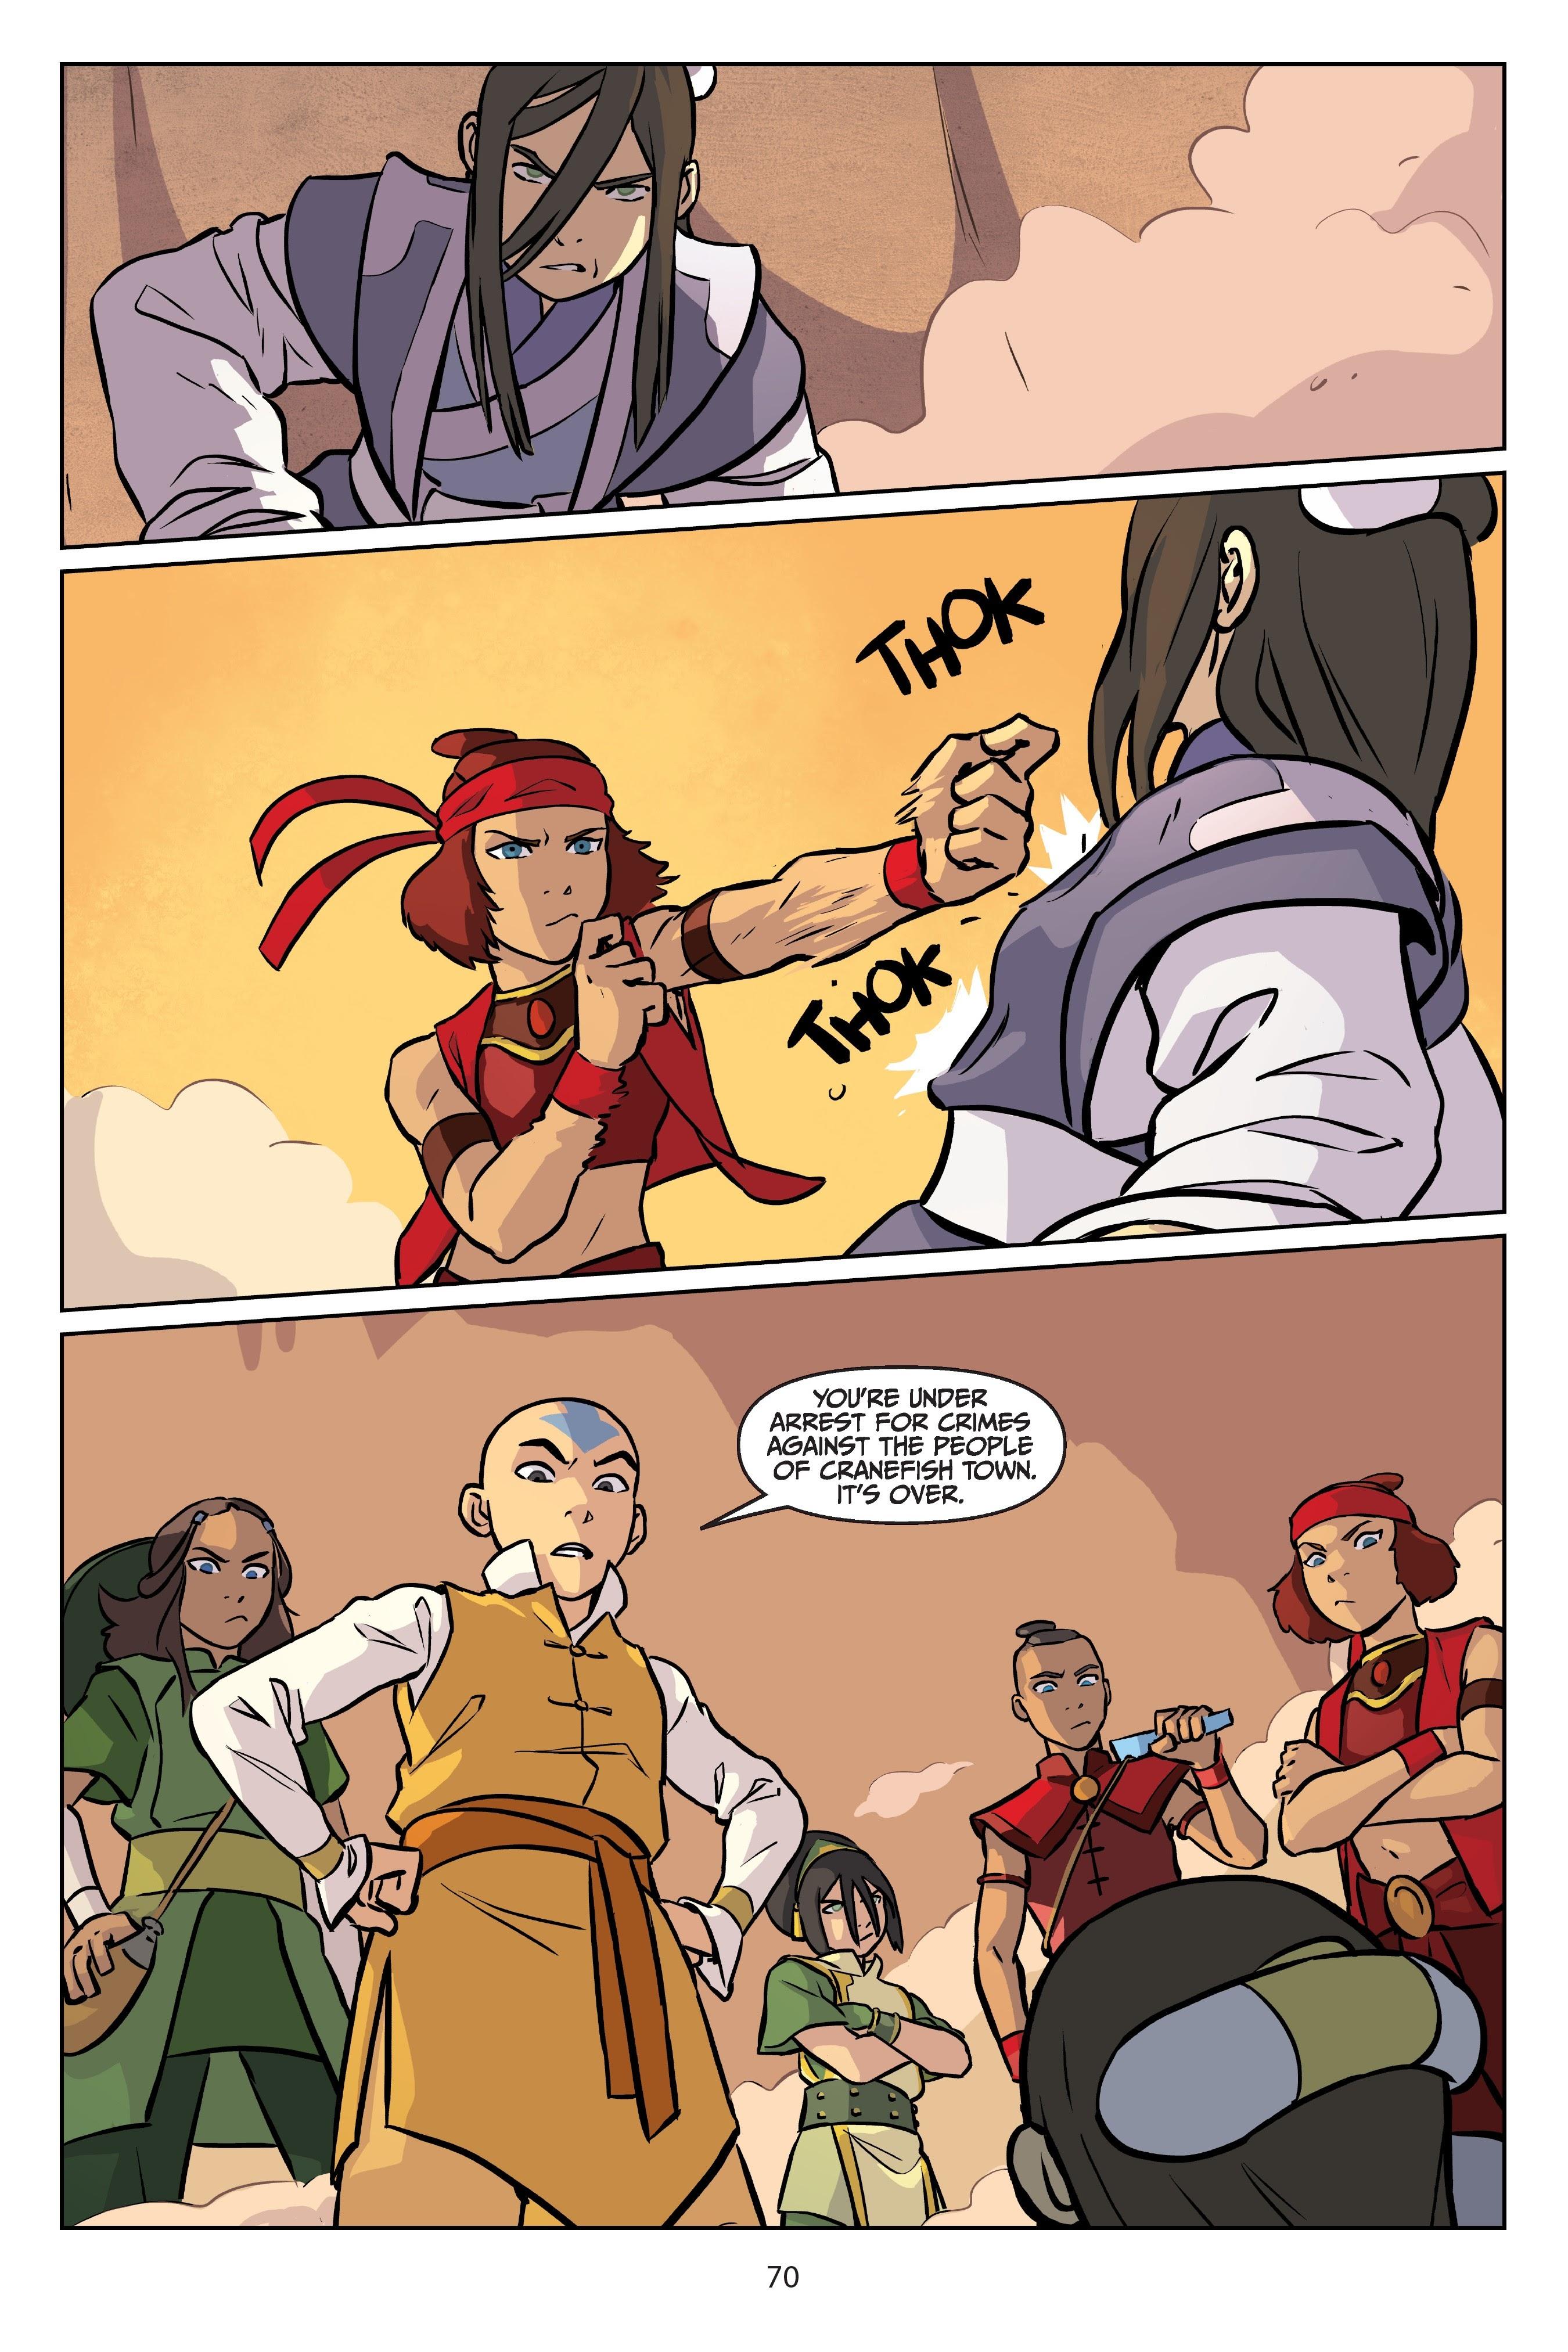 Nickelodeon Avatar: The Last Airbender - Imbalance TPB_2 Page 70